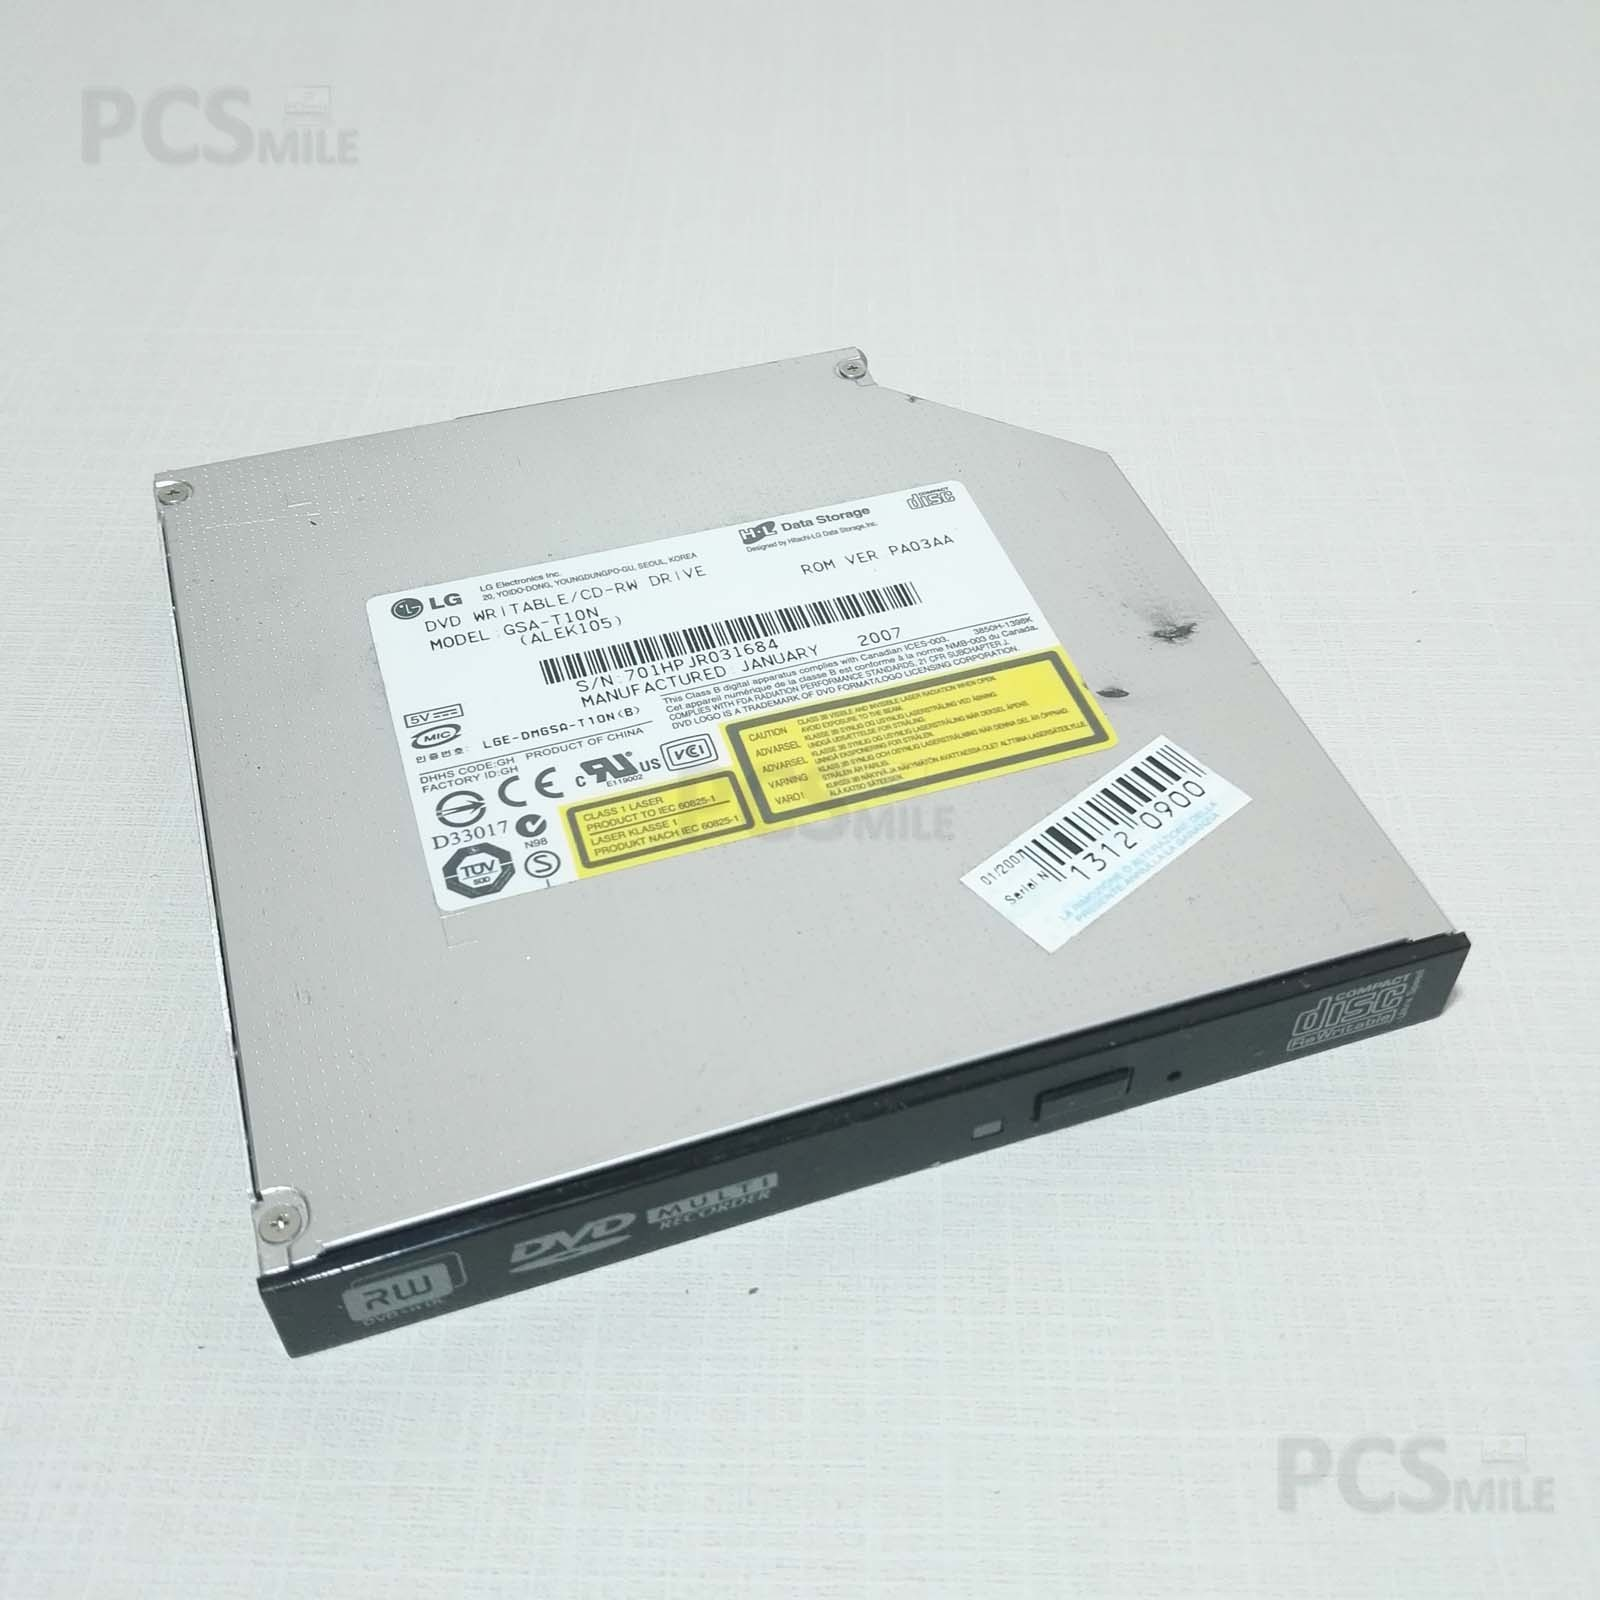 Lettore CD DVD masterizzatore IDE Olidata tehom CW4800 GSA-T10N (ALEK105)